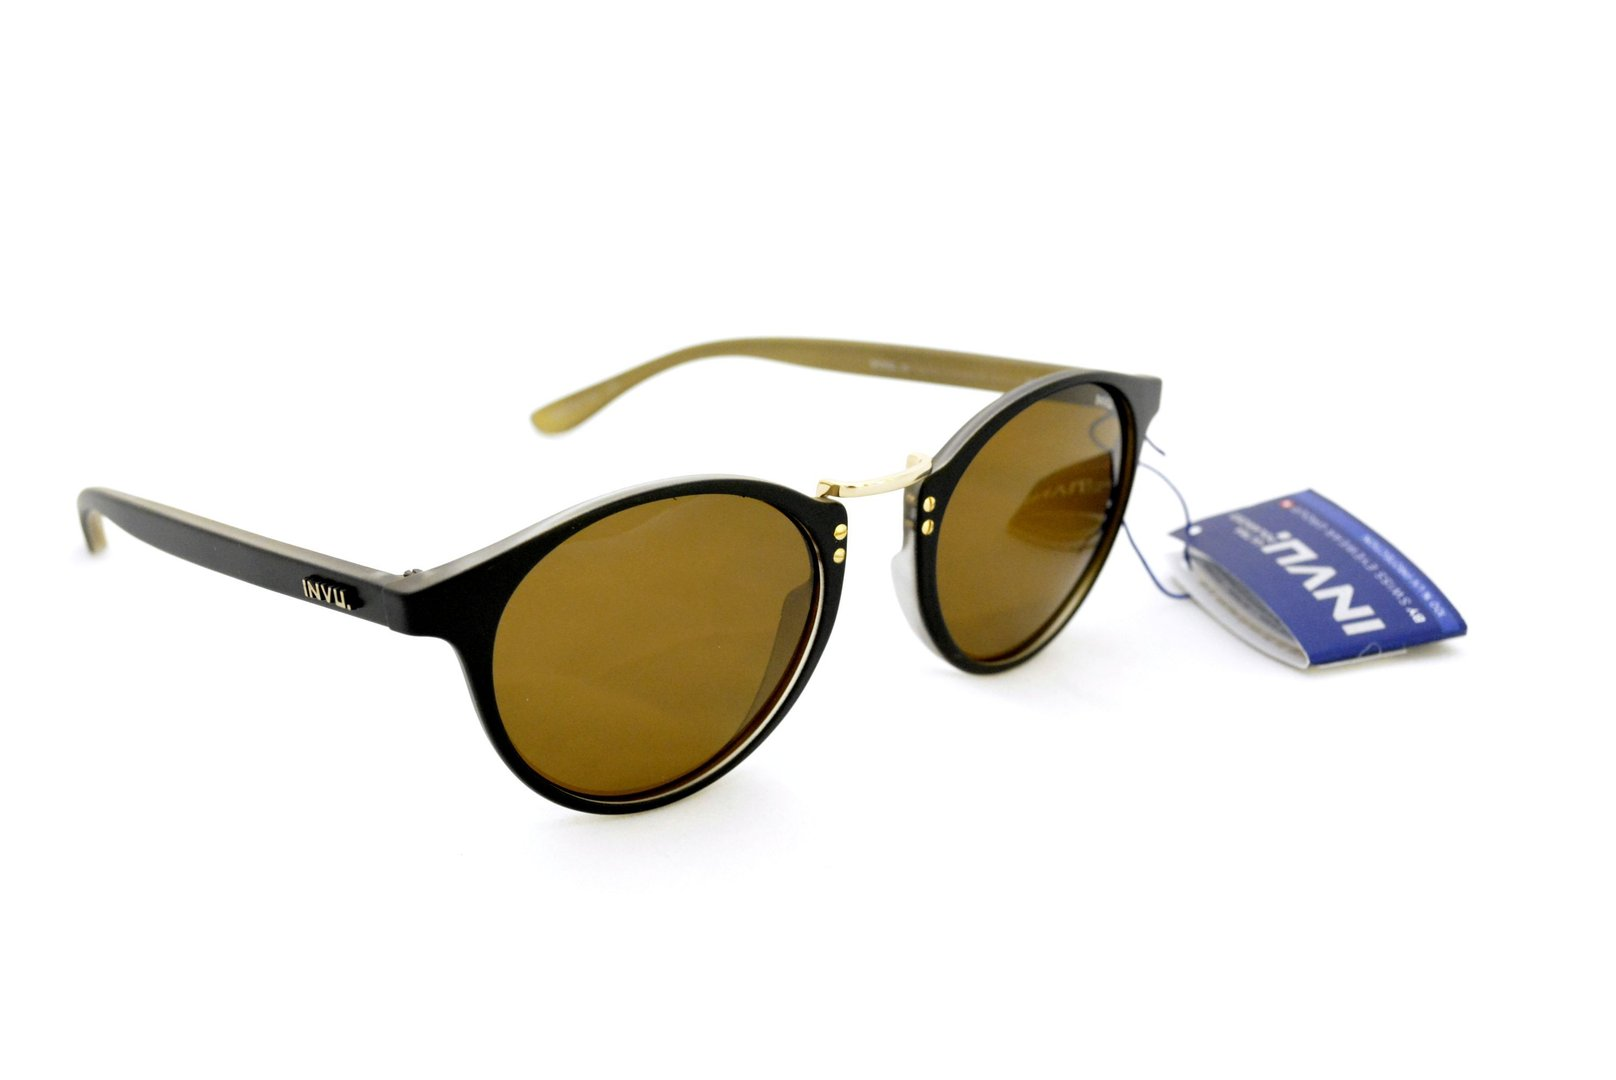 8b4763f2fb Sunglasses INVU T 2621 A BLACK LENSES POLARIZED OTTICA TRAINA